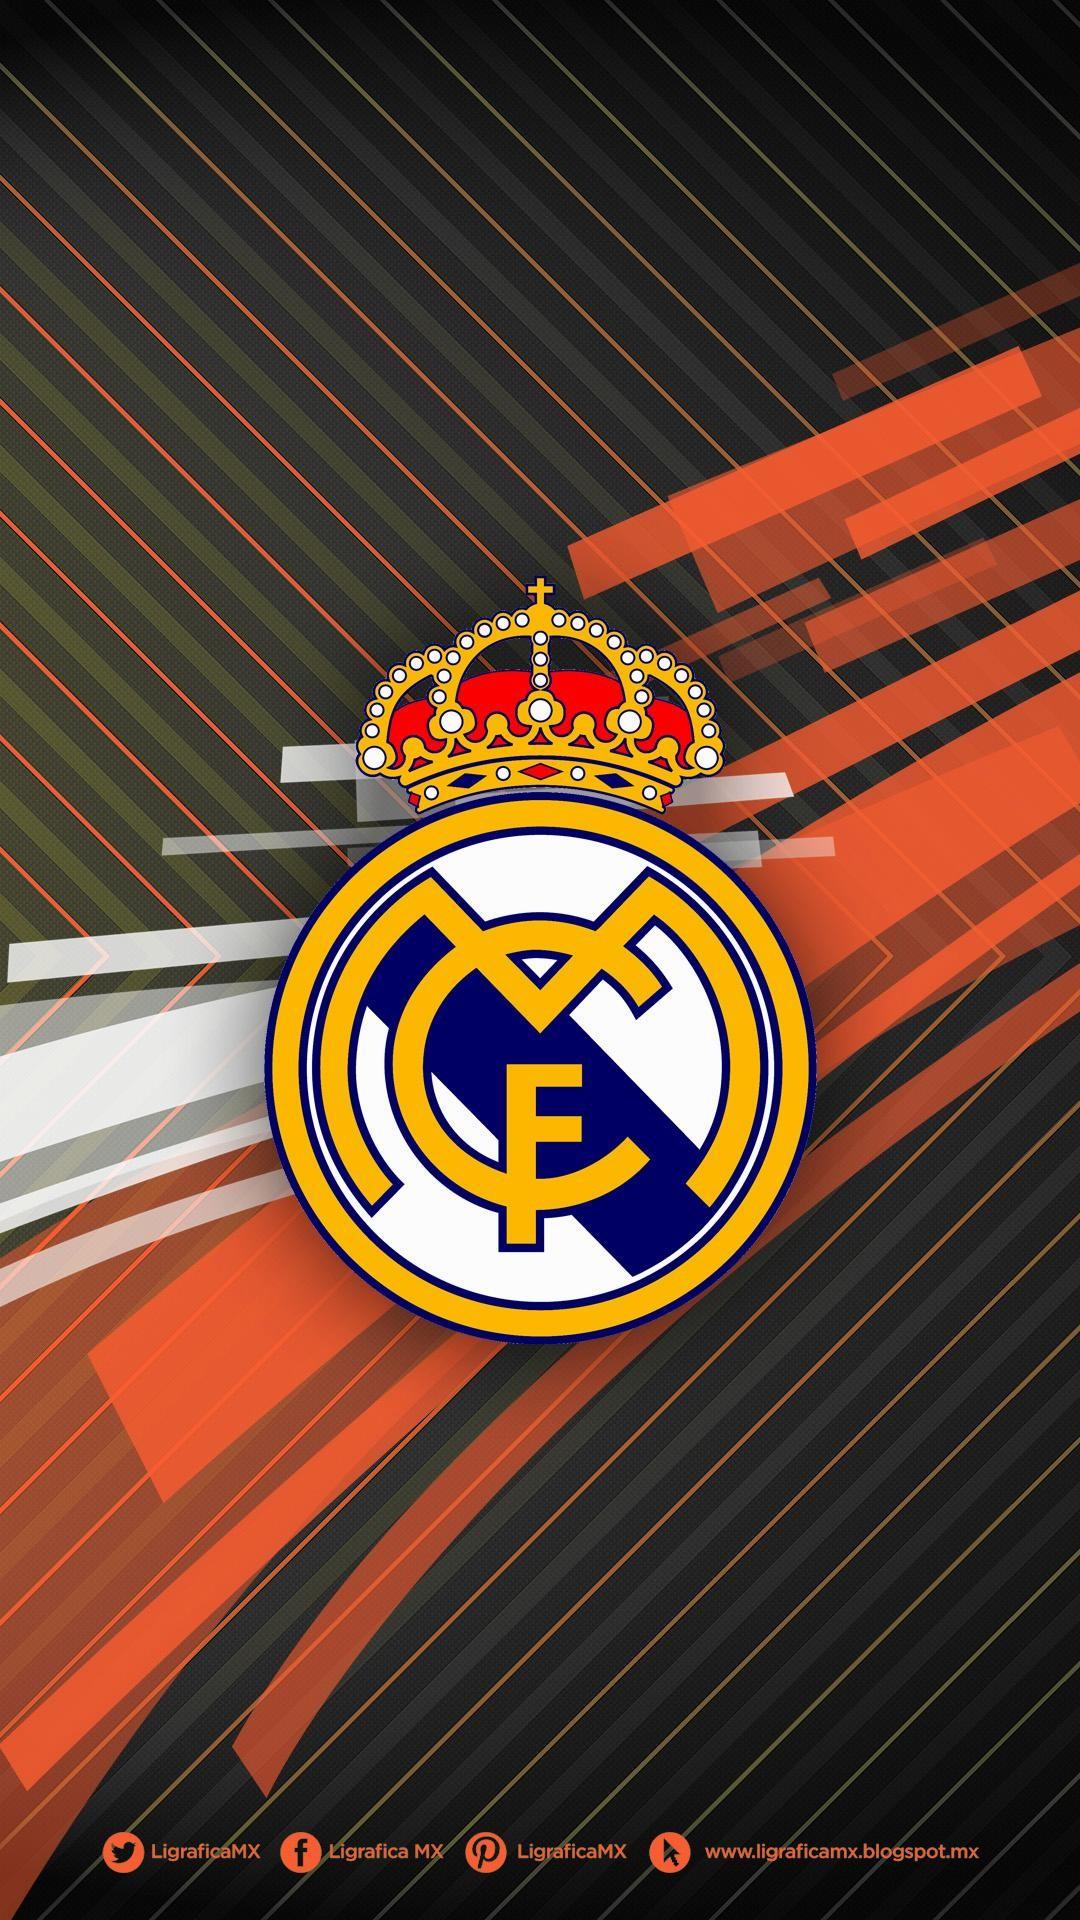 Res: 1080x1920, Real-Madrid-%E2%80%A2-LigraficaMX-CTG-wallpaper